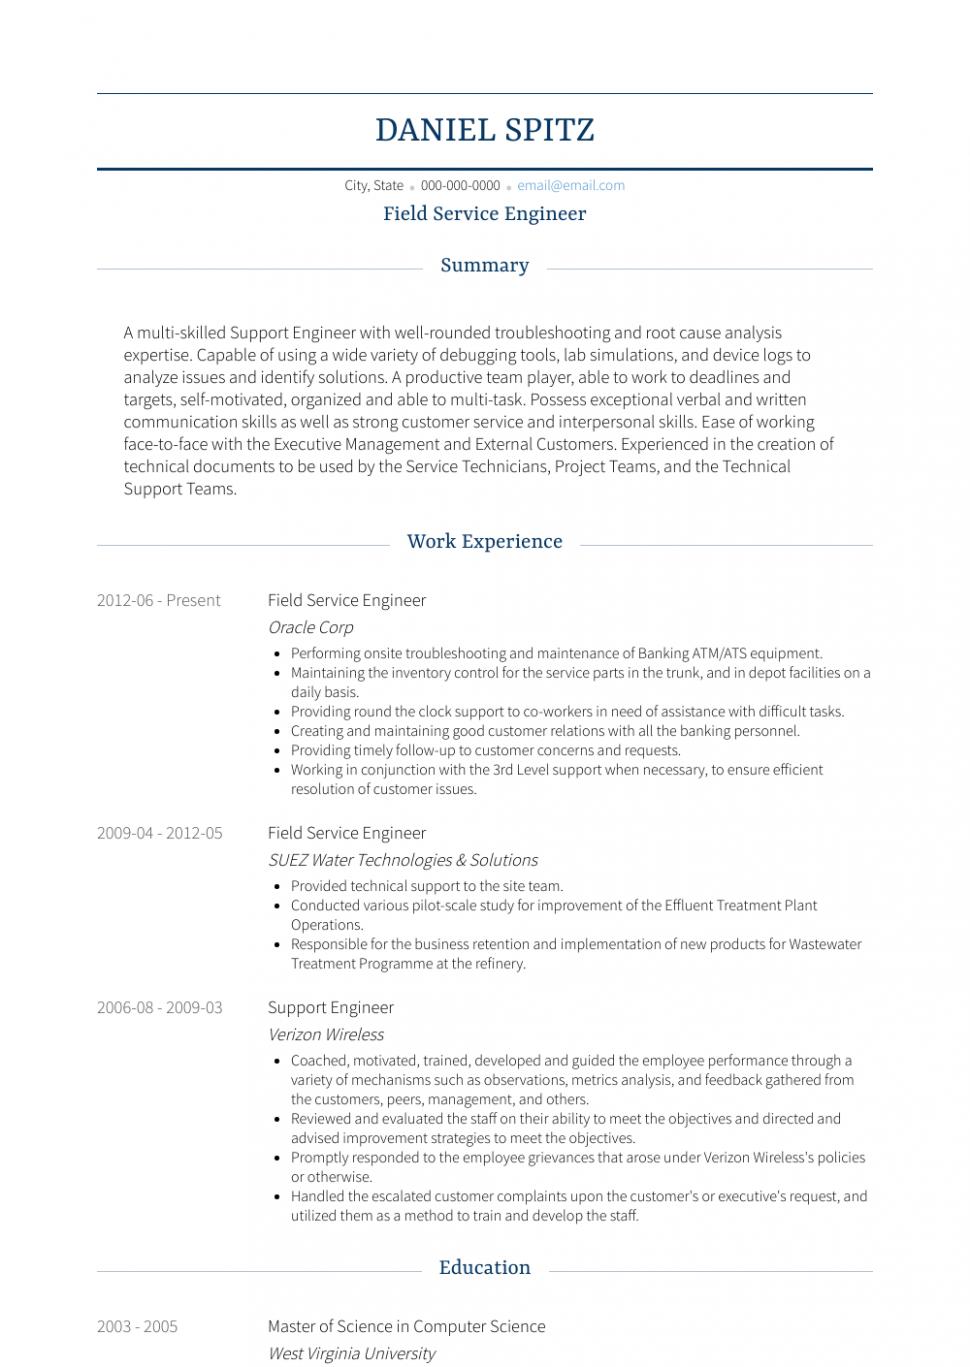 Sample Resume Nutritionist Resumesdesign Sample Resume Templates Resume Sample Resume